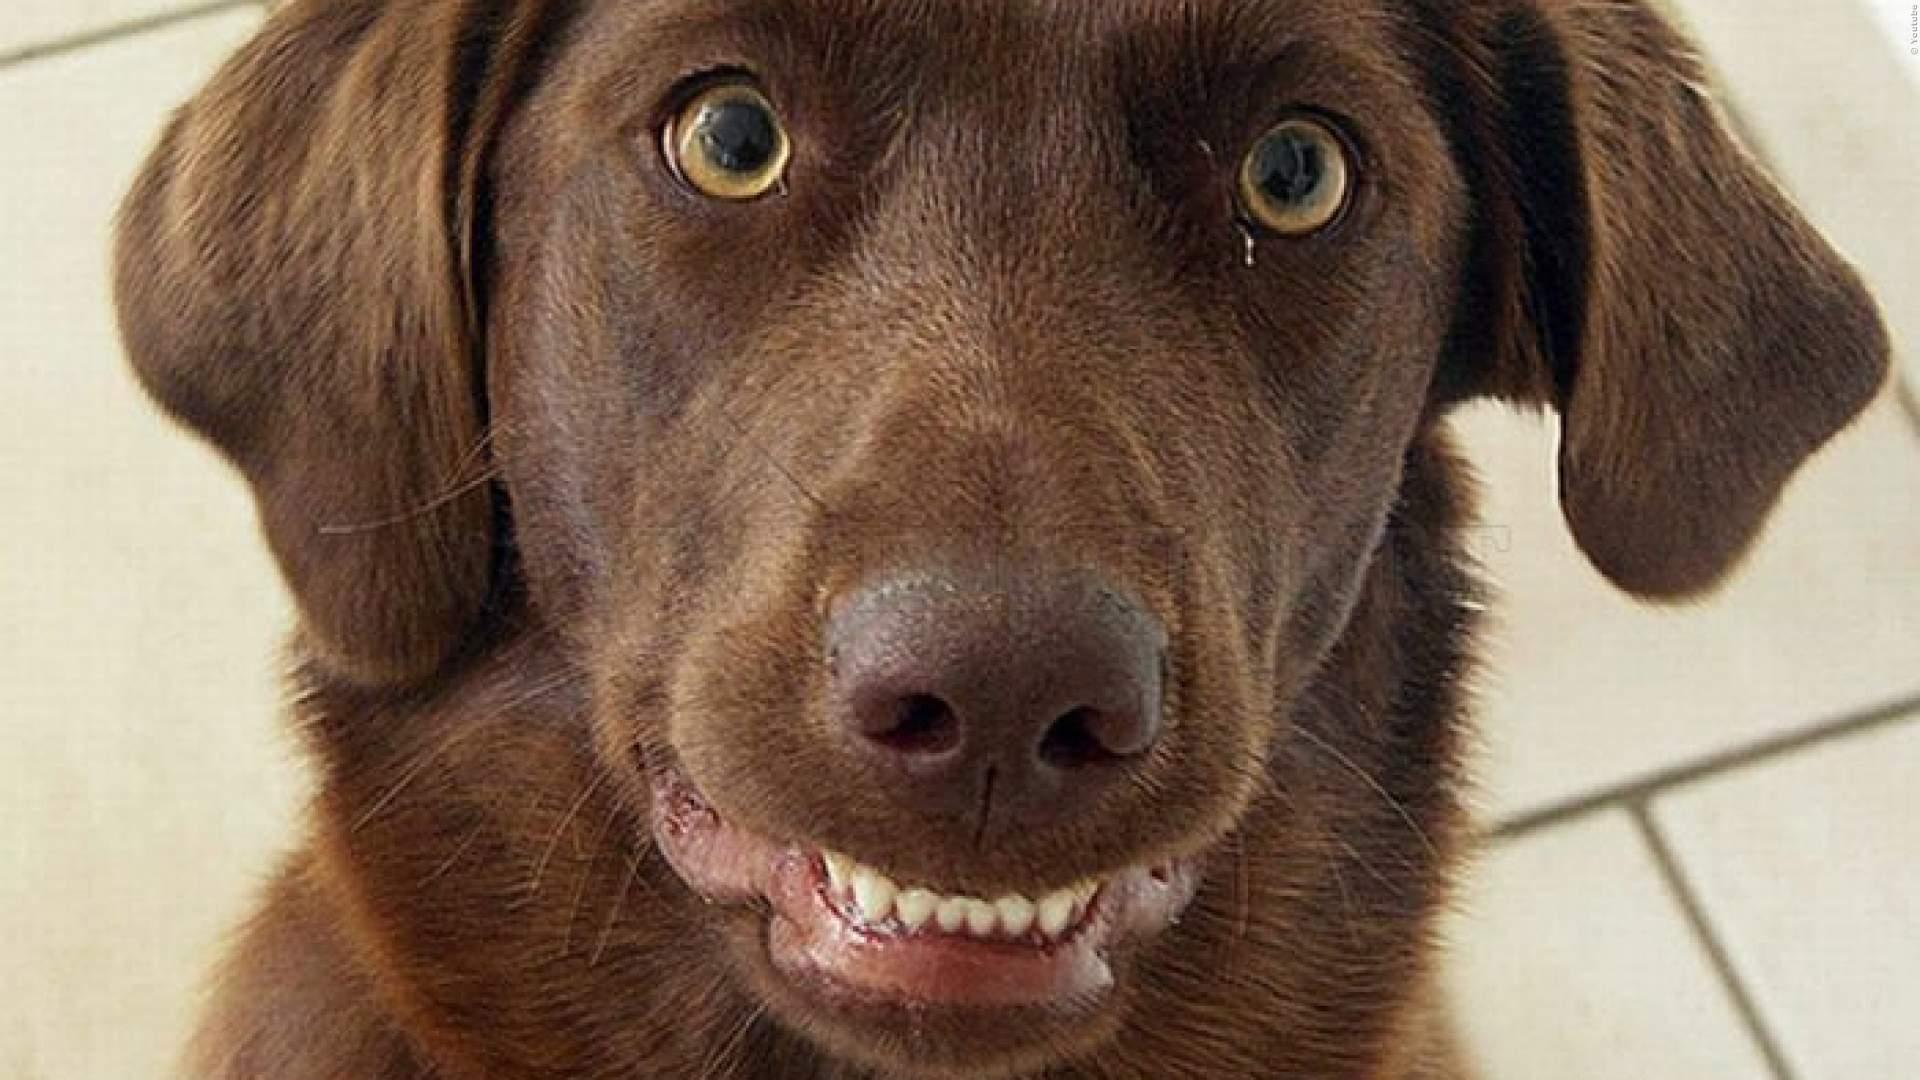 VIDEO: Hund frisst Joint - total bekiffter Hund